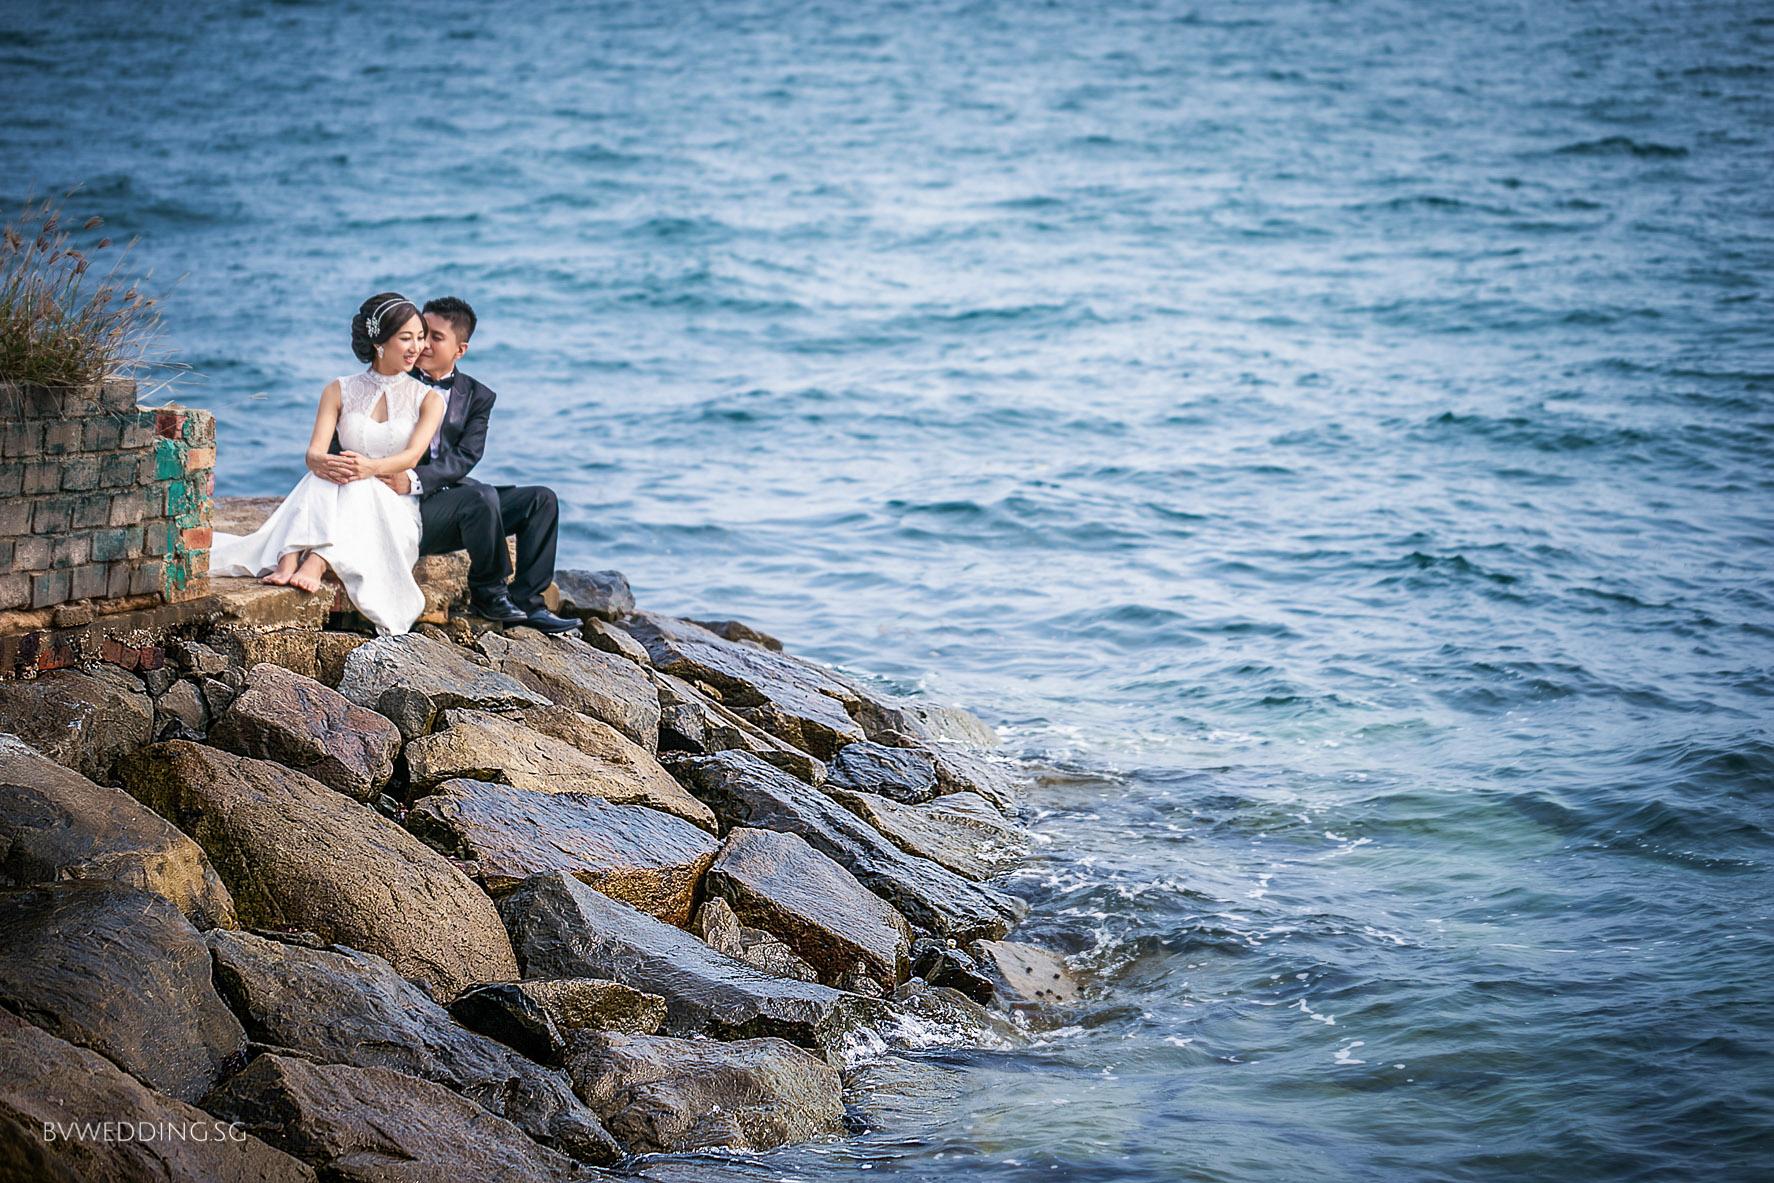 Pre-wedding Photoshoot at sentosa beach